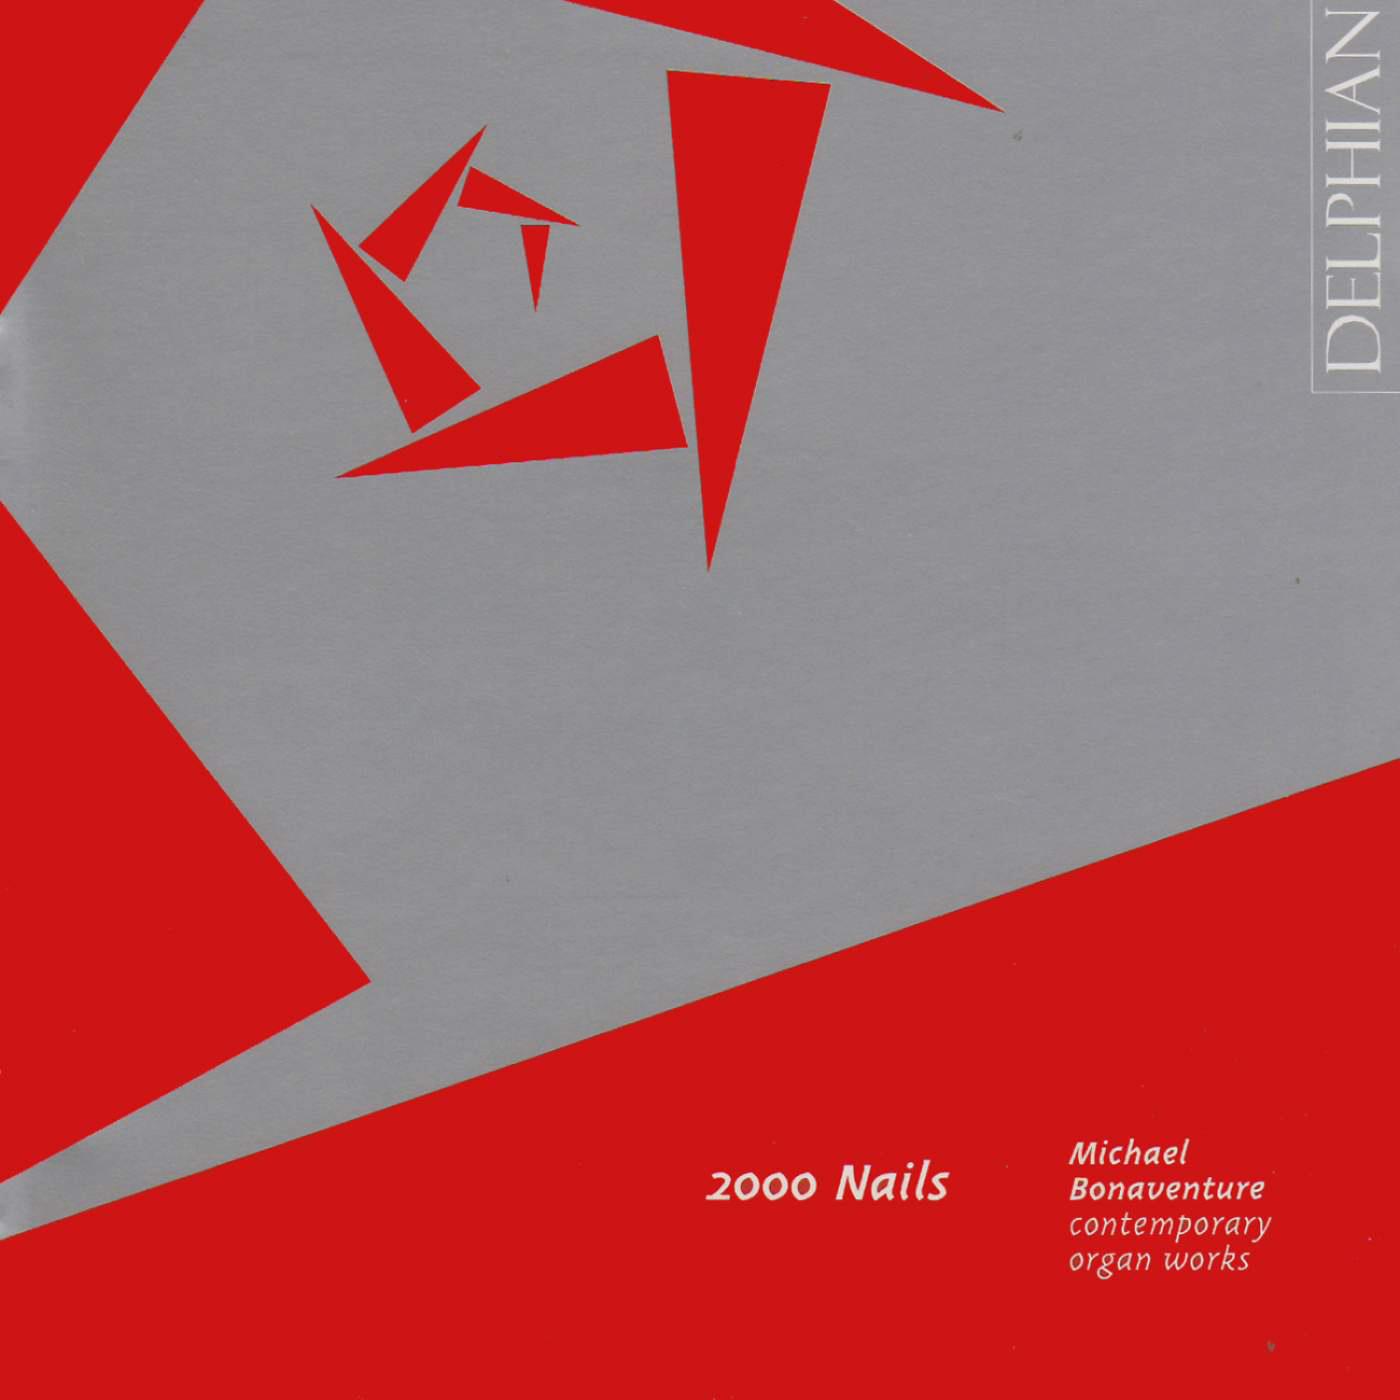 2000 Nails: Contemporary Organ Works